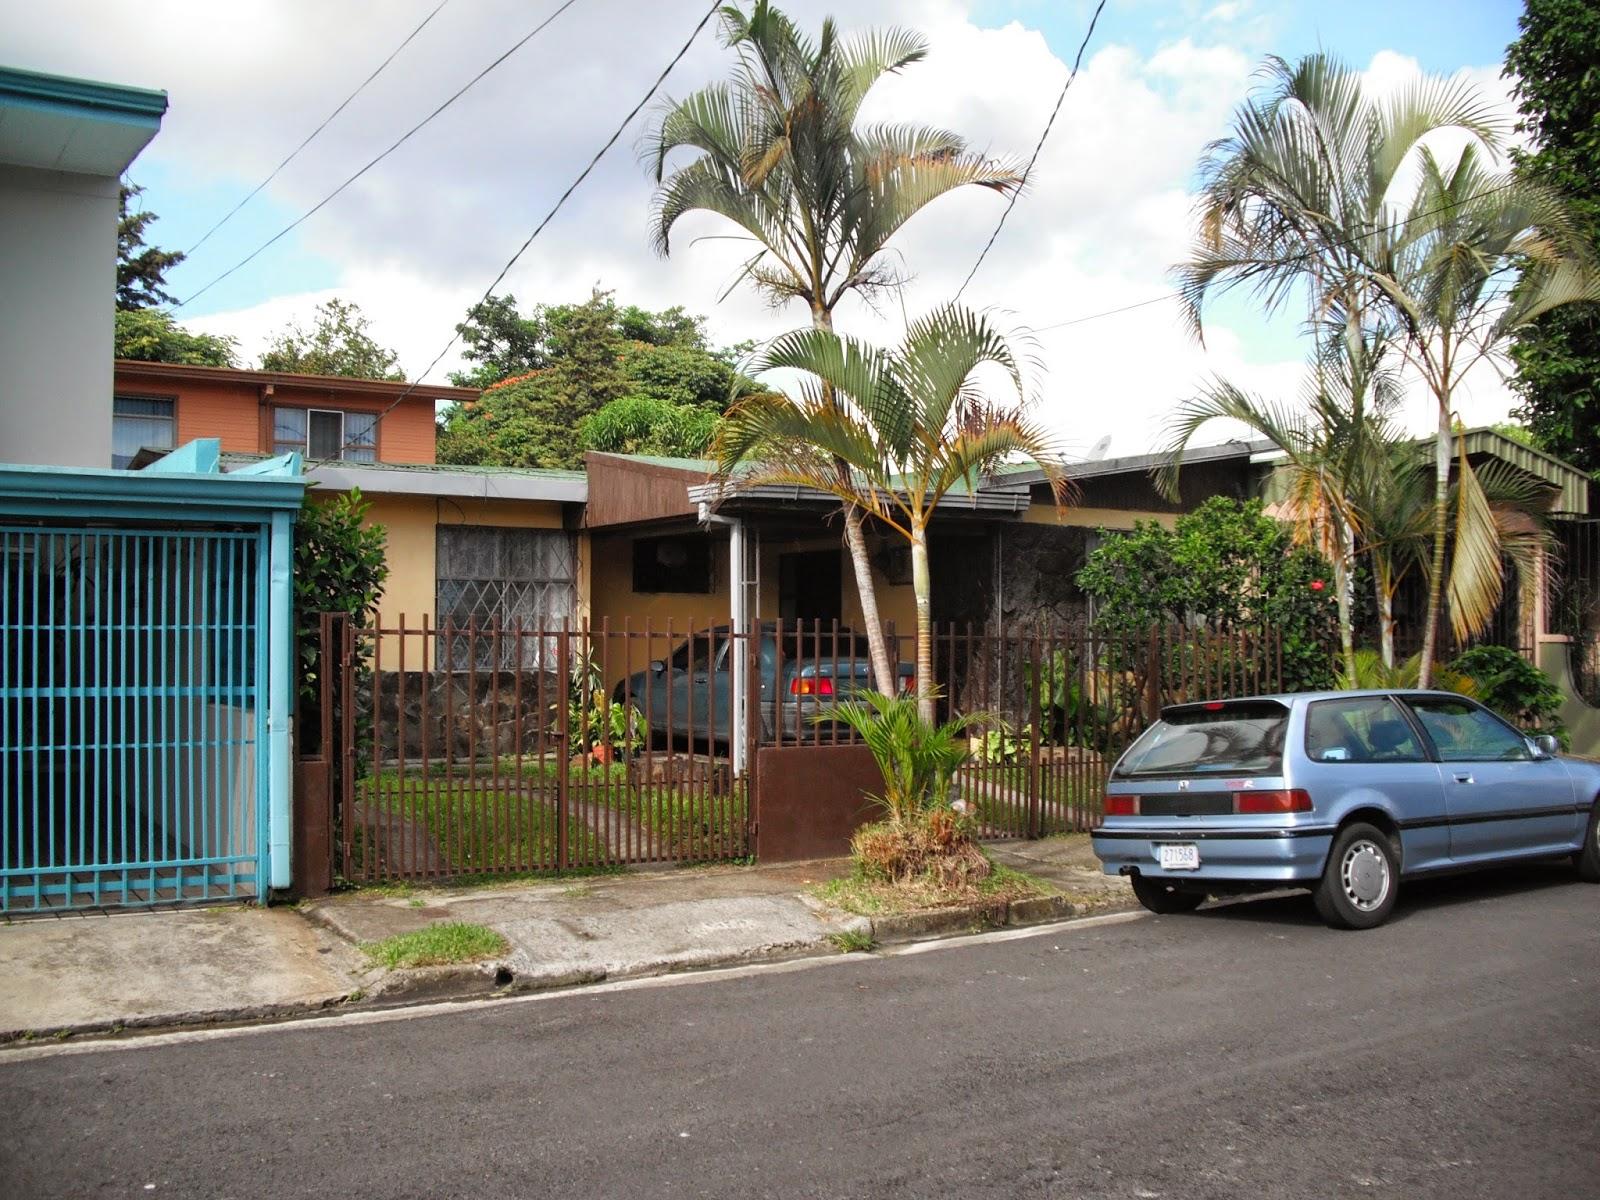 Costa Rica Invest: Bars on Windows